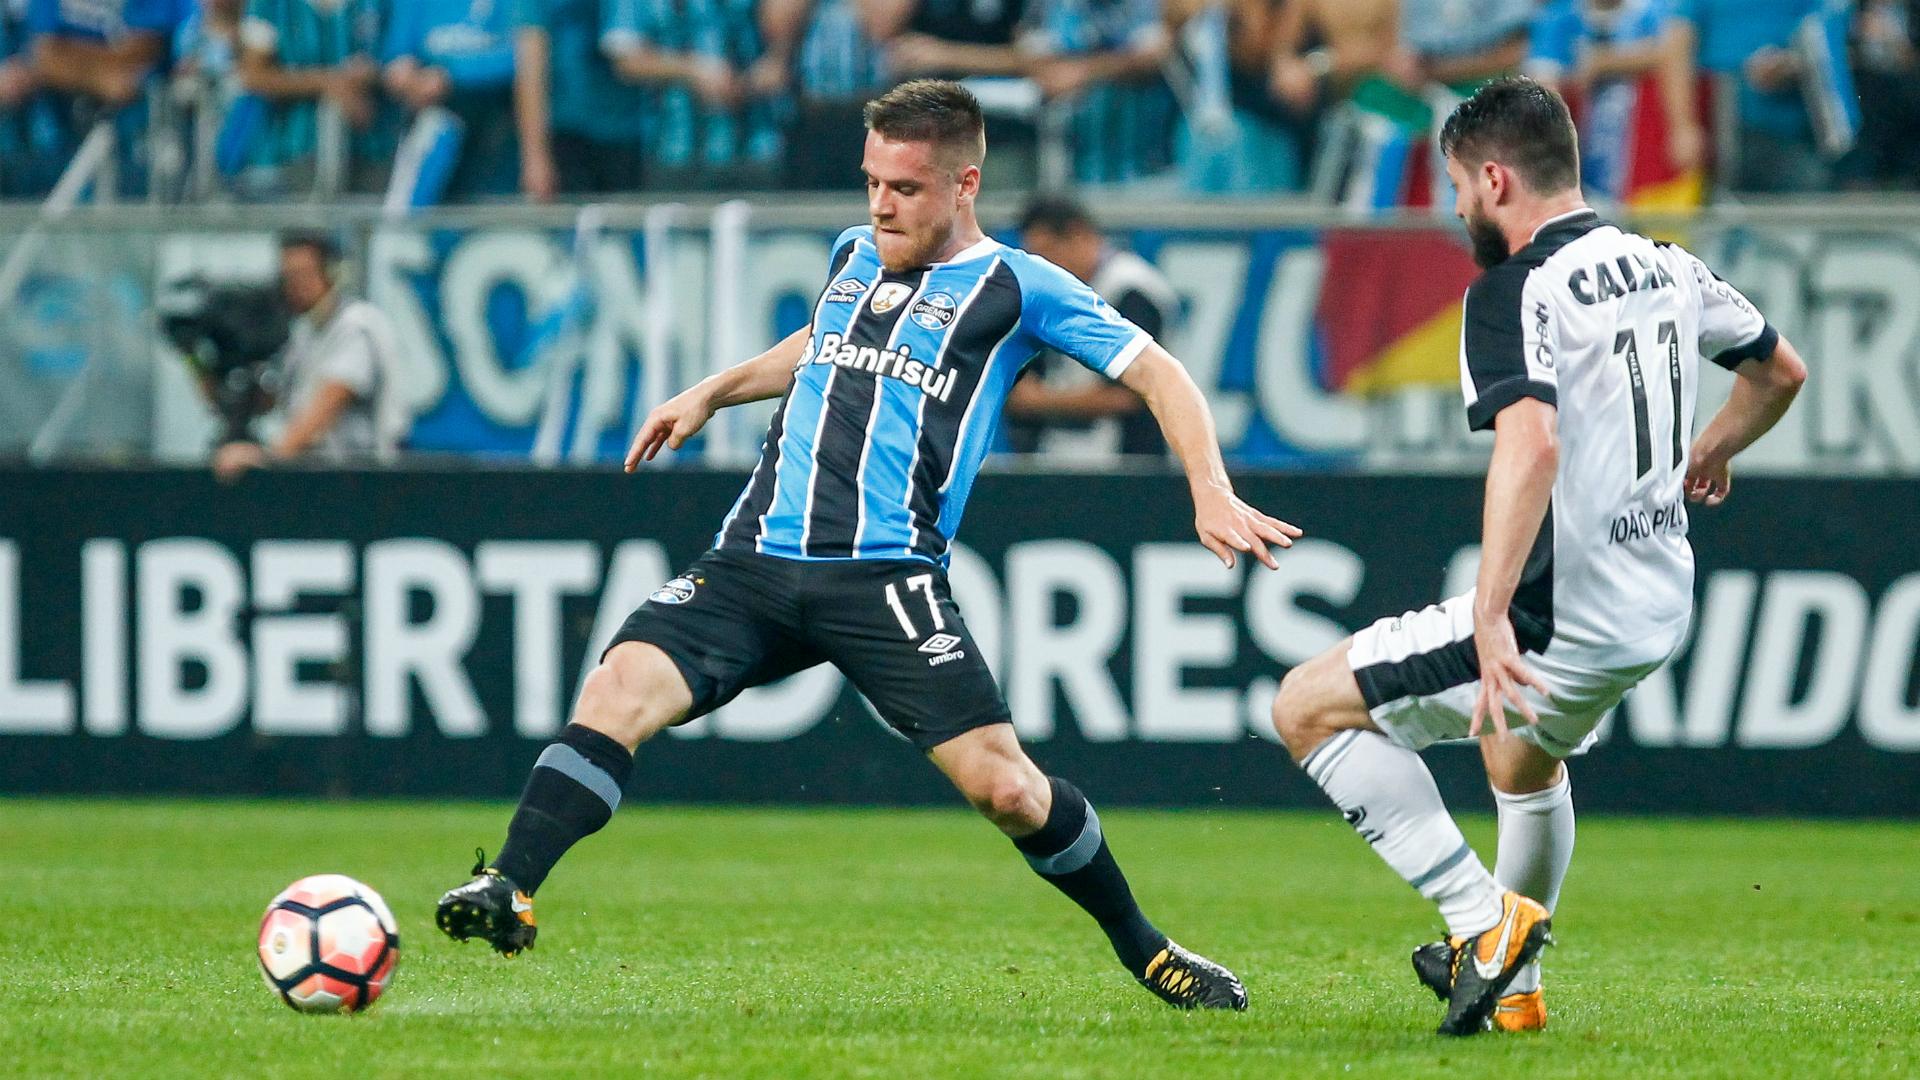 Ramiro I Grêmio Botafogo I 20 09 17